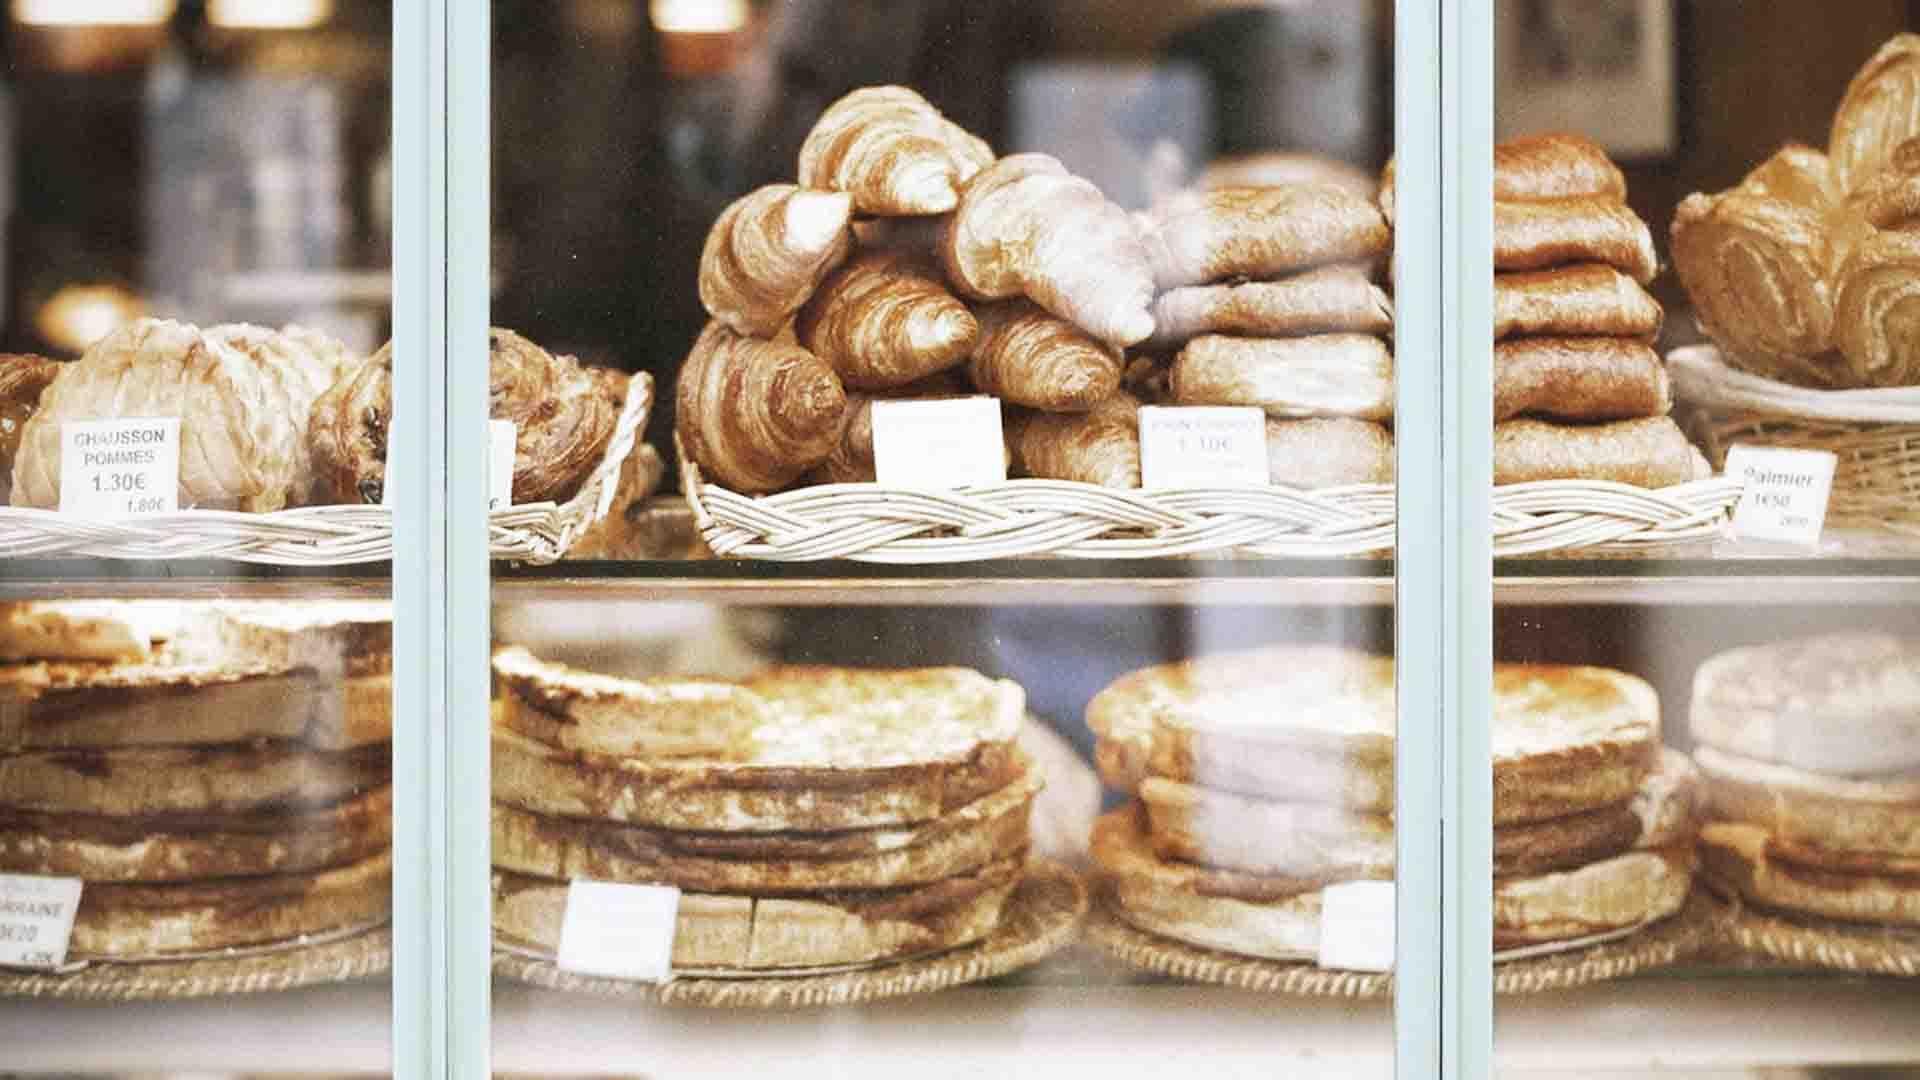 produit français local boulangerie pain français